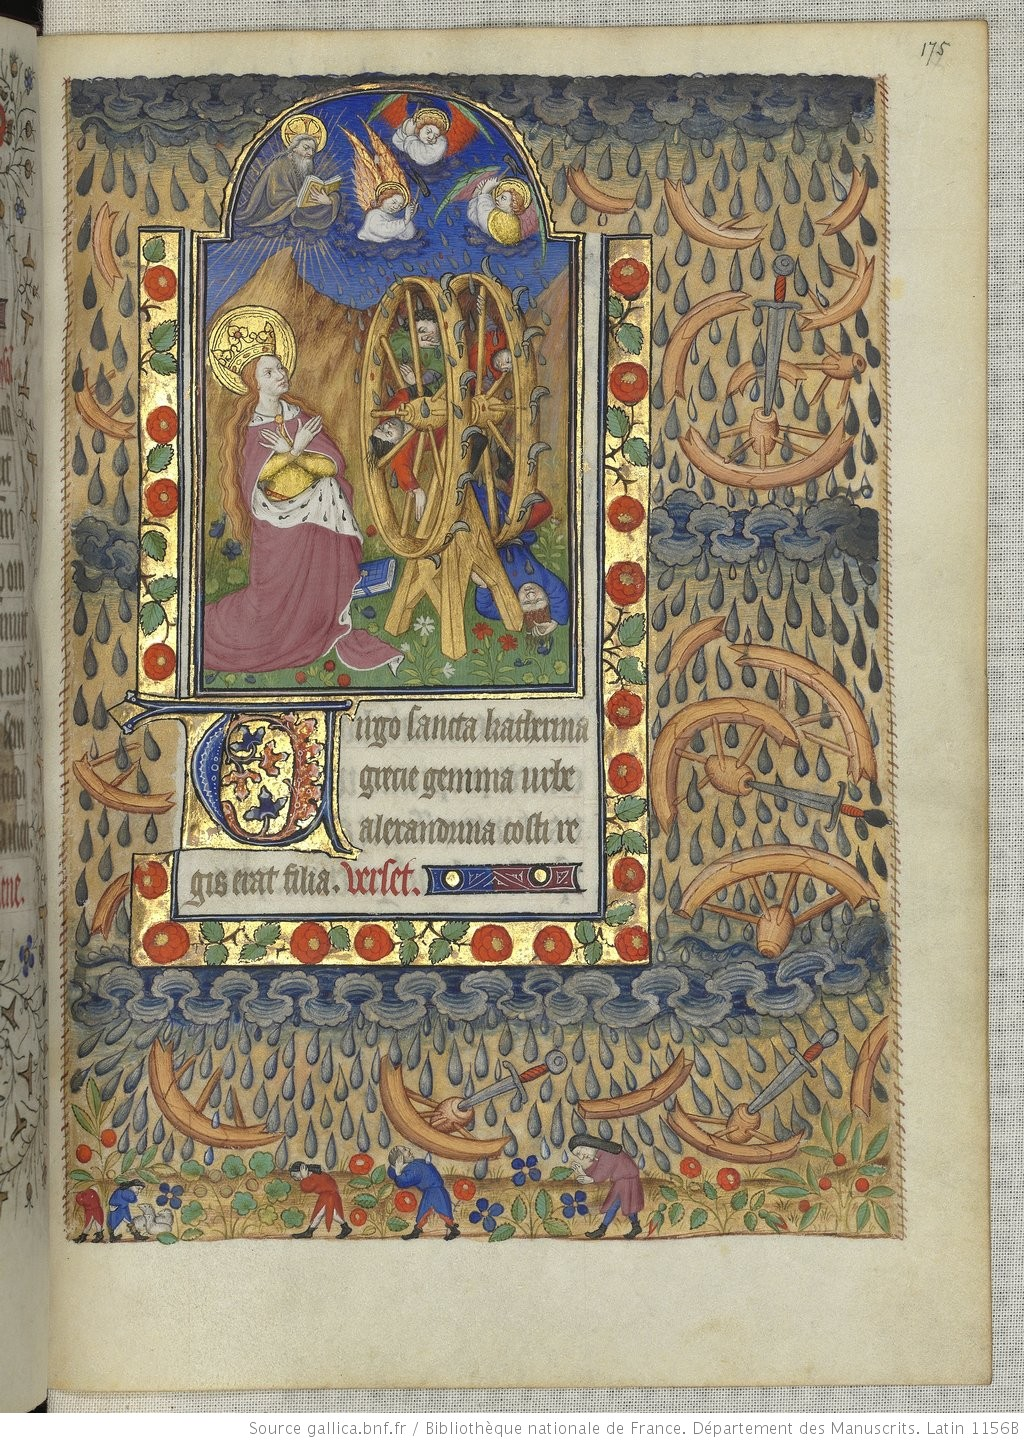 Heures de Marguerite d'Orleans 1430 ca BNF Latin 1156B fol 175r Gallica